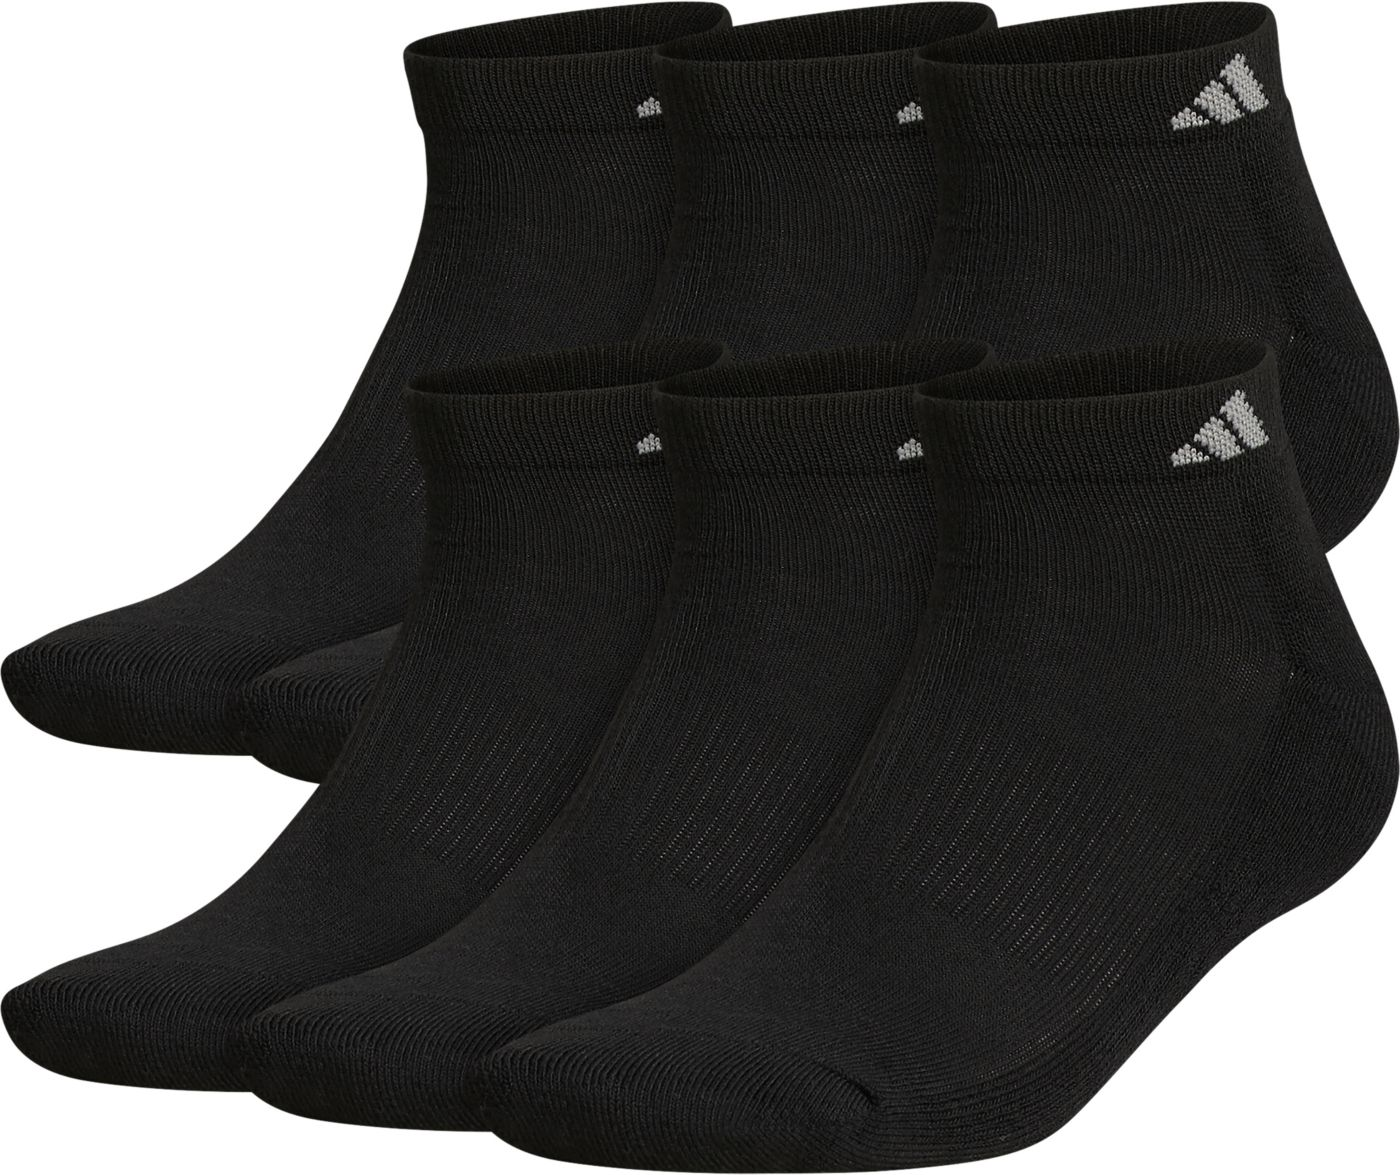 adidas Men's Athletic Low Cut Socks - 6 Pack